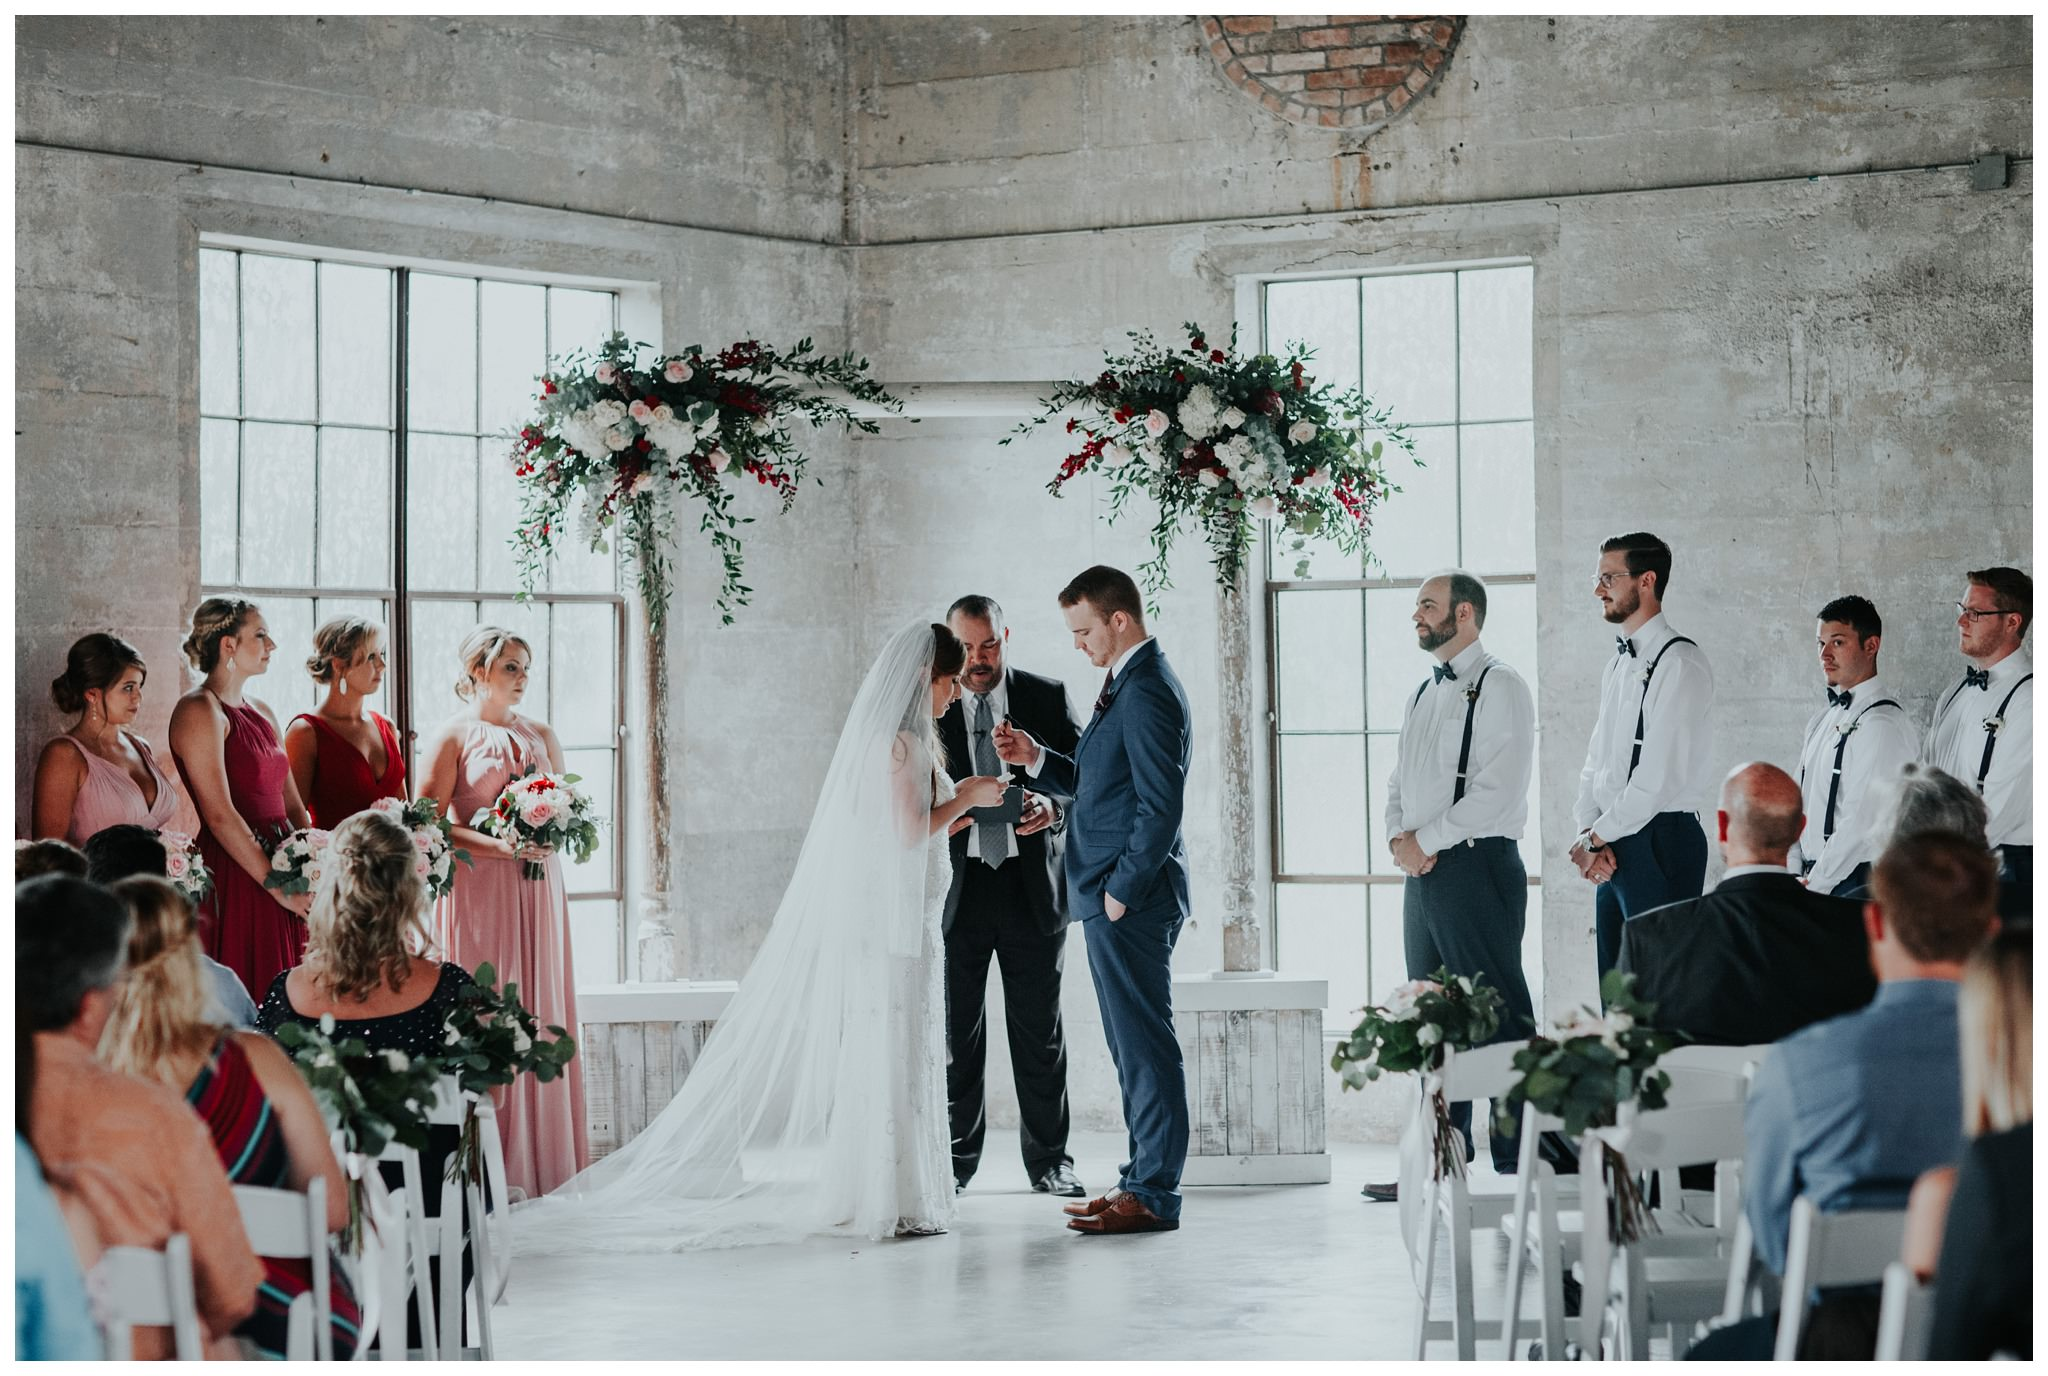 Summertime Olde Dobbin Station - Magnolia Wedding - The Woodlands Texas Wedding Photographer-2157.jpg